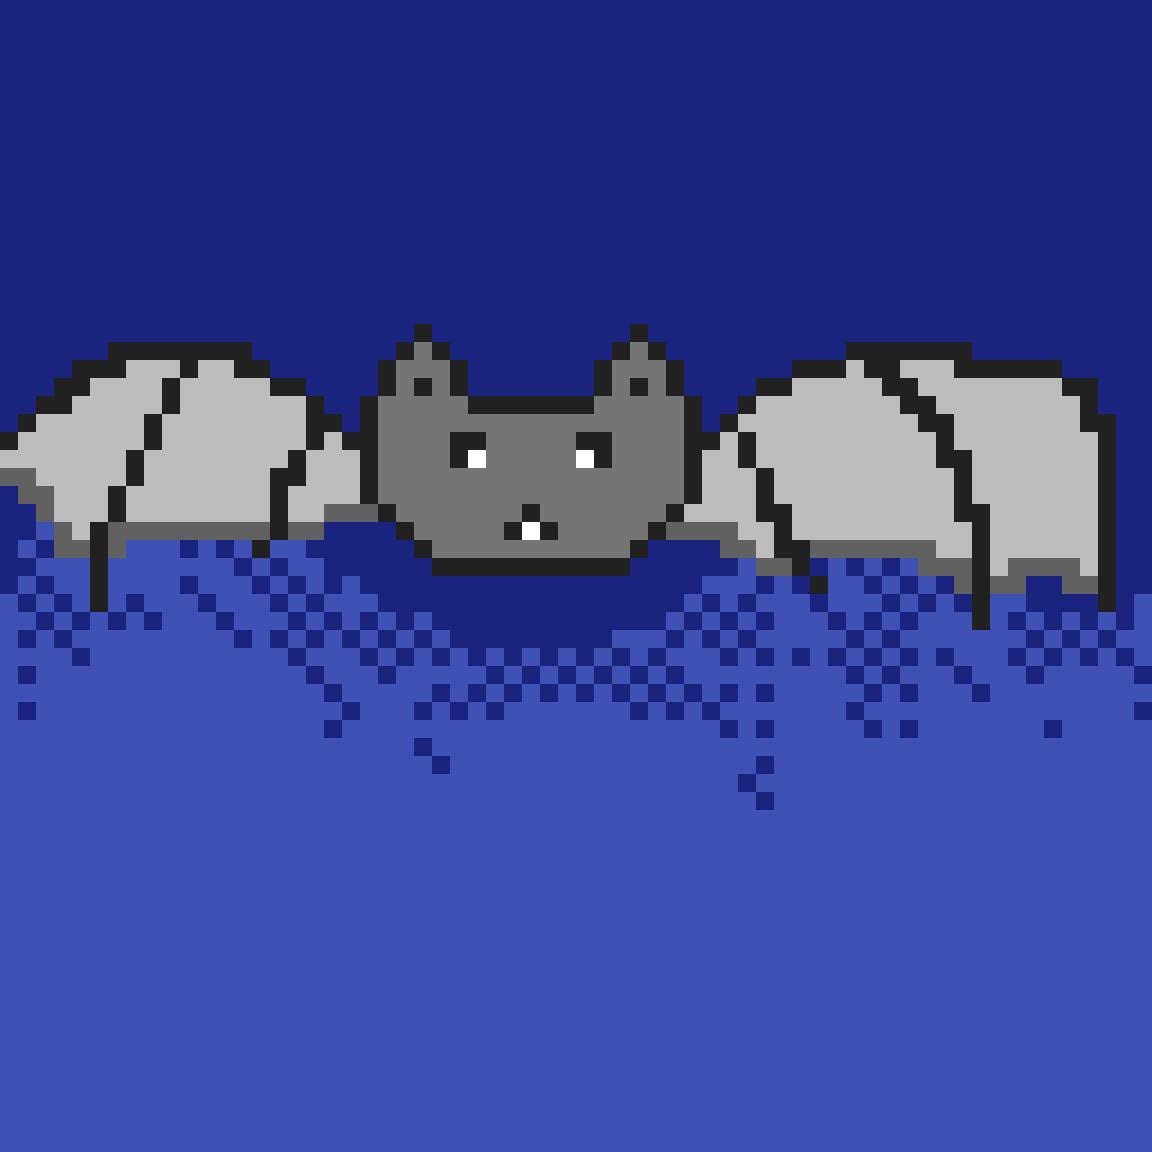 Bat by Daxeto